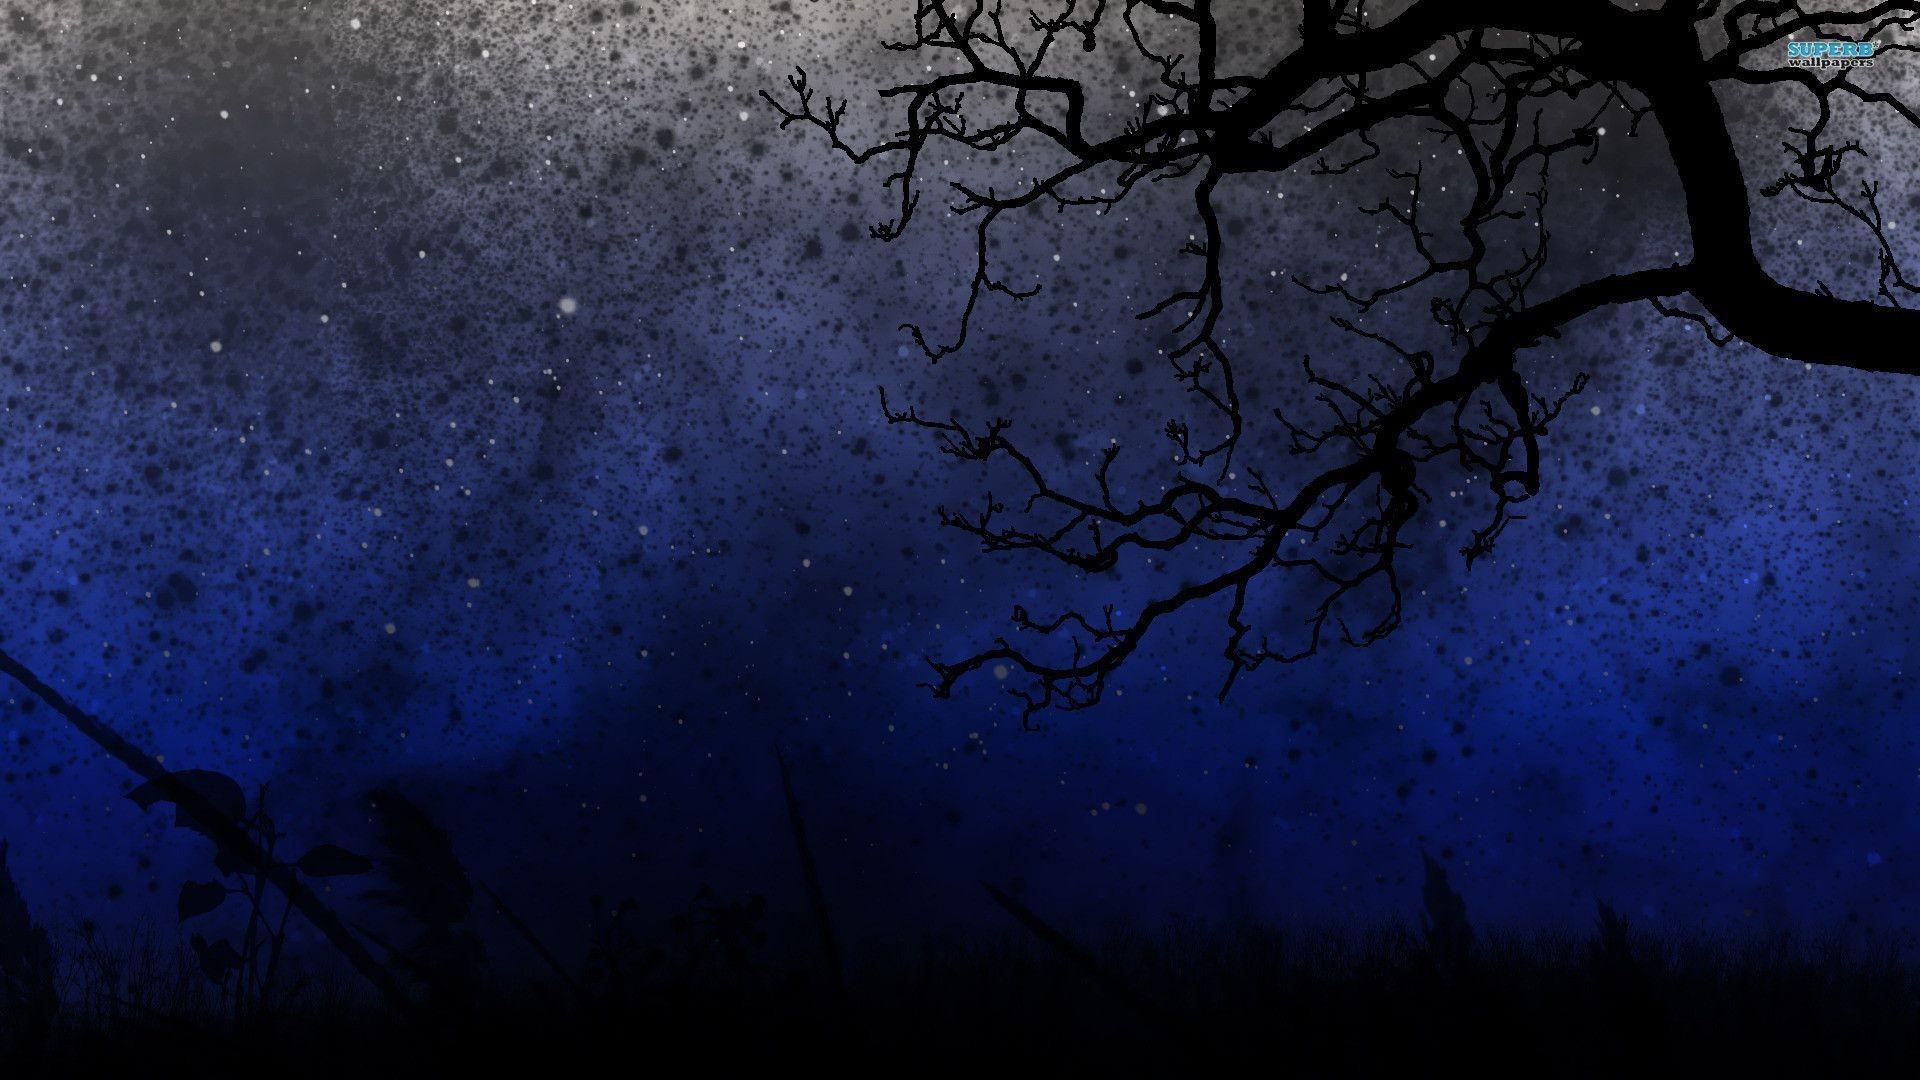 8. starry-night-sky-wallpaper8-600×338